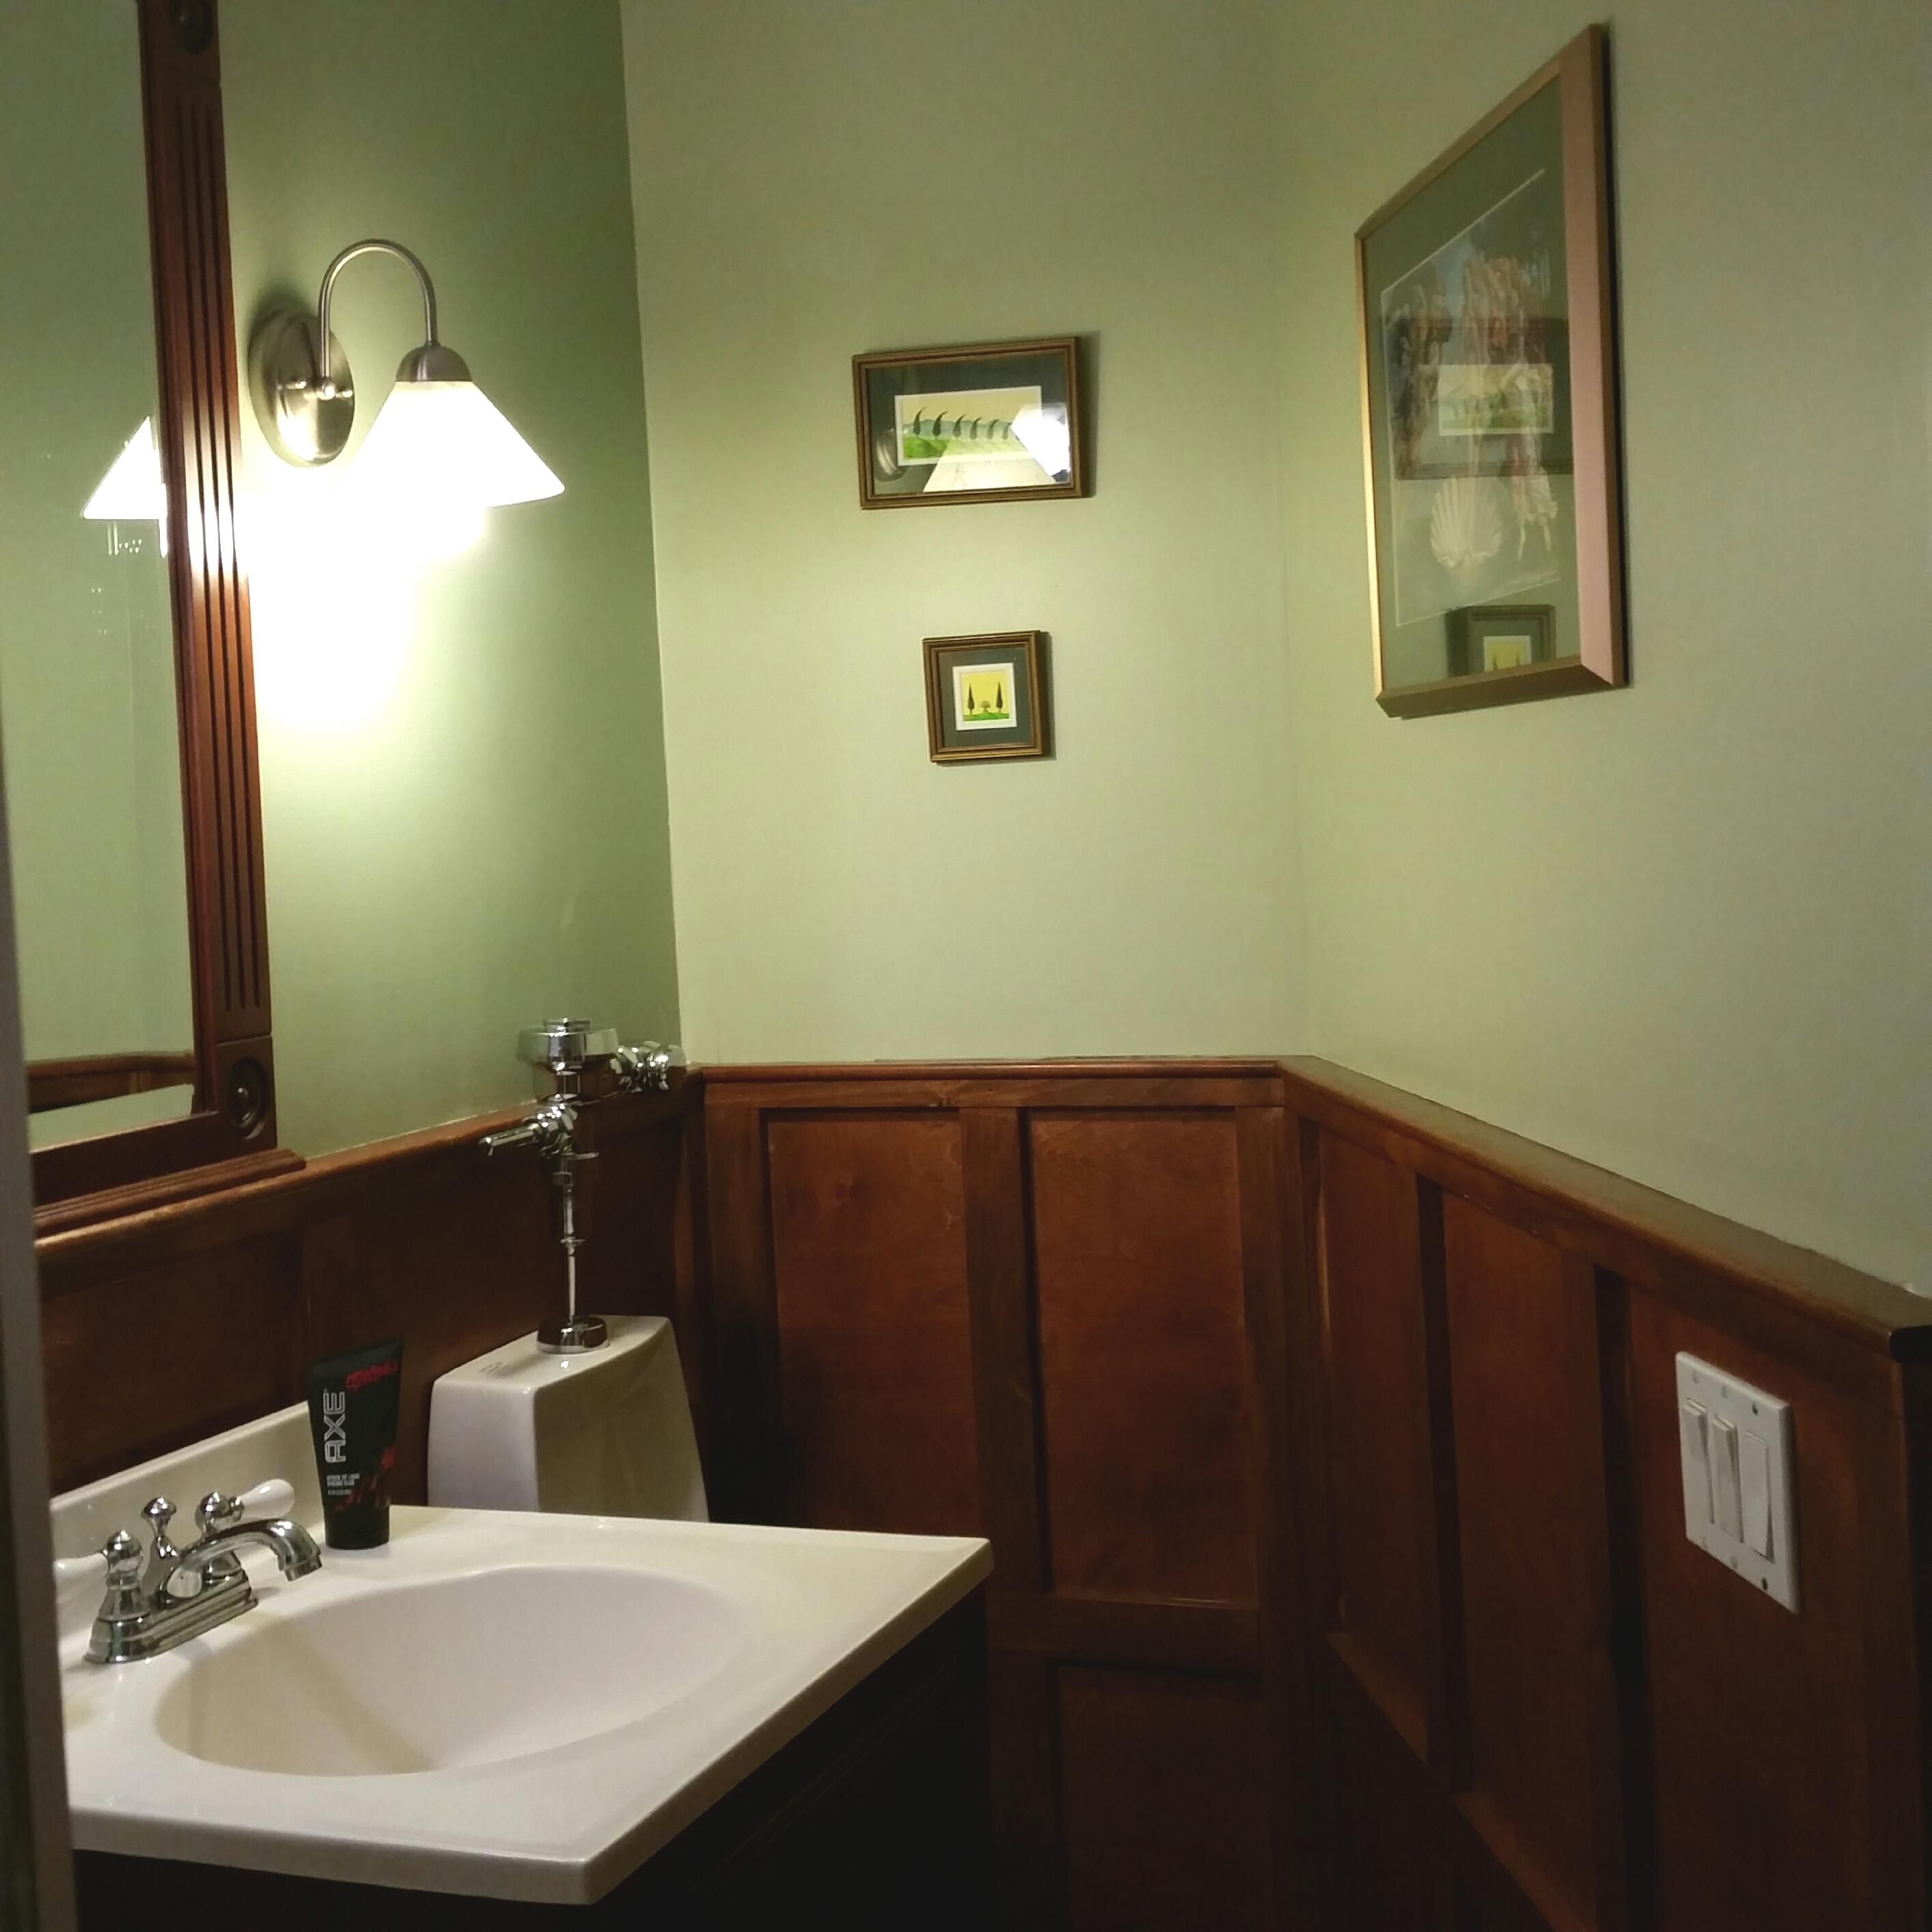 Bathroom Renovation Before